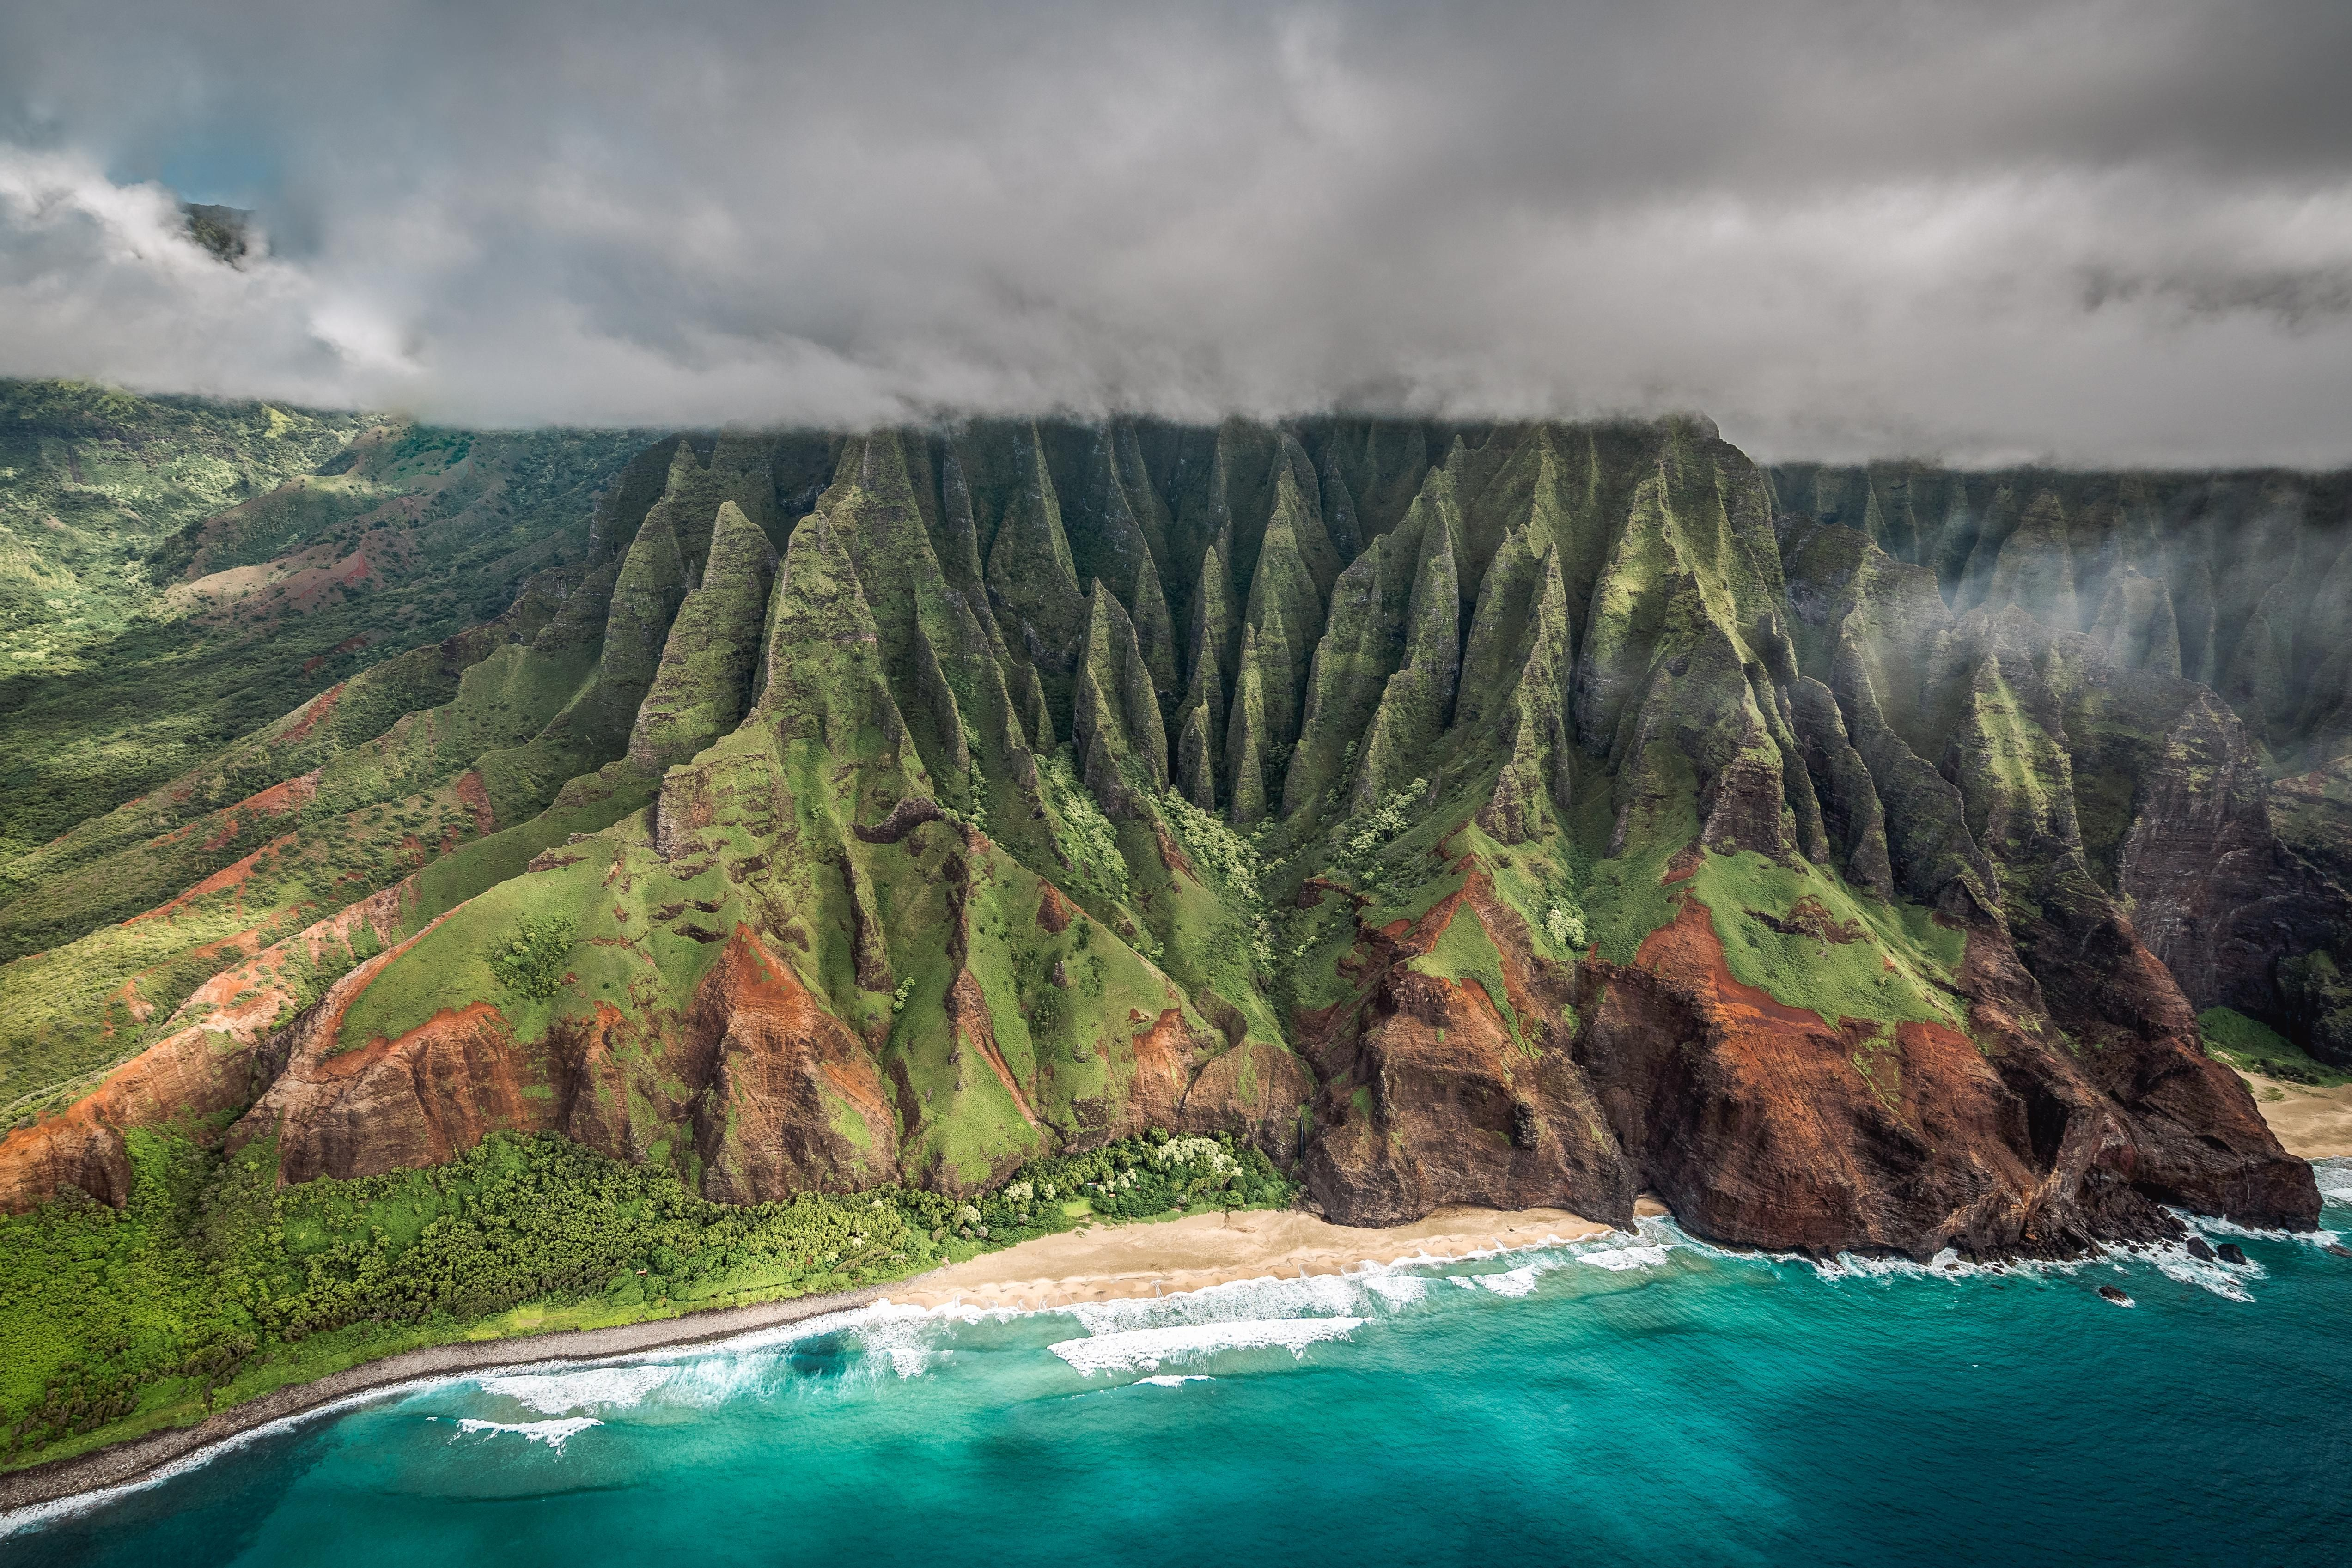 7x10 FT Hawaiian Vinyl Photography Backdrop,Aerial View of Na Pali Coast Kauai Hawaii Mountain Cliff Seacoast Scenic Photo Background for Party Home Decor Outdoorsy Theme Shoot Props